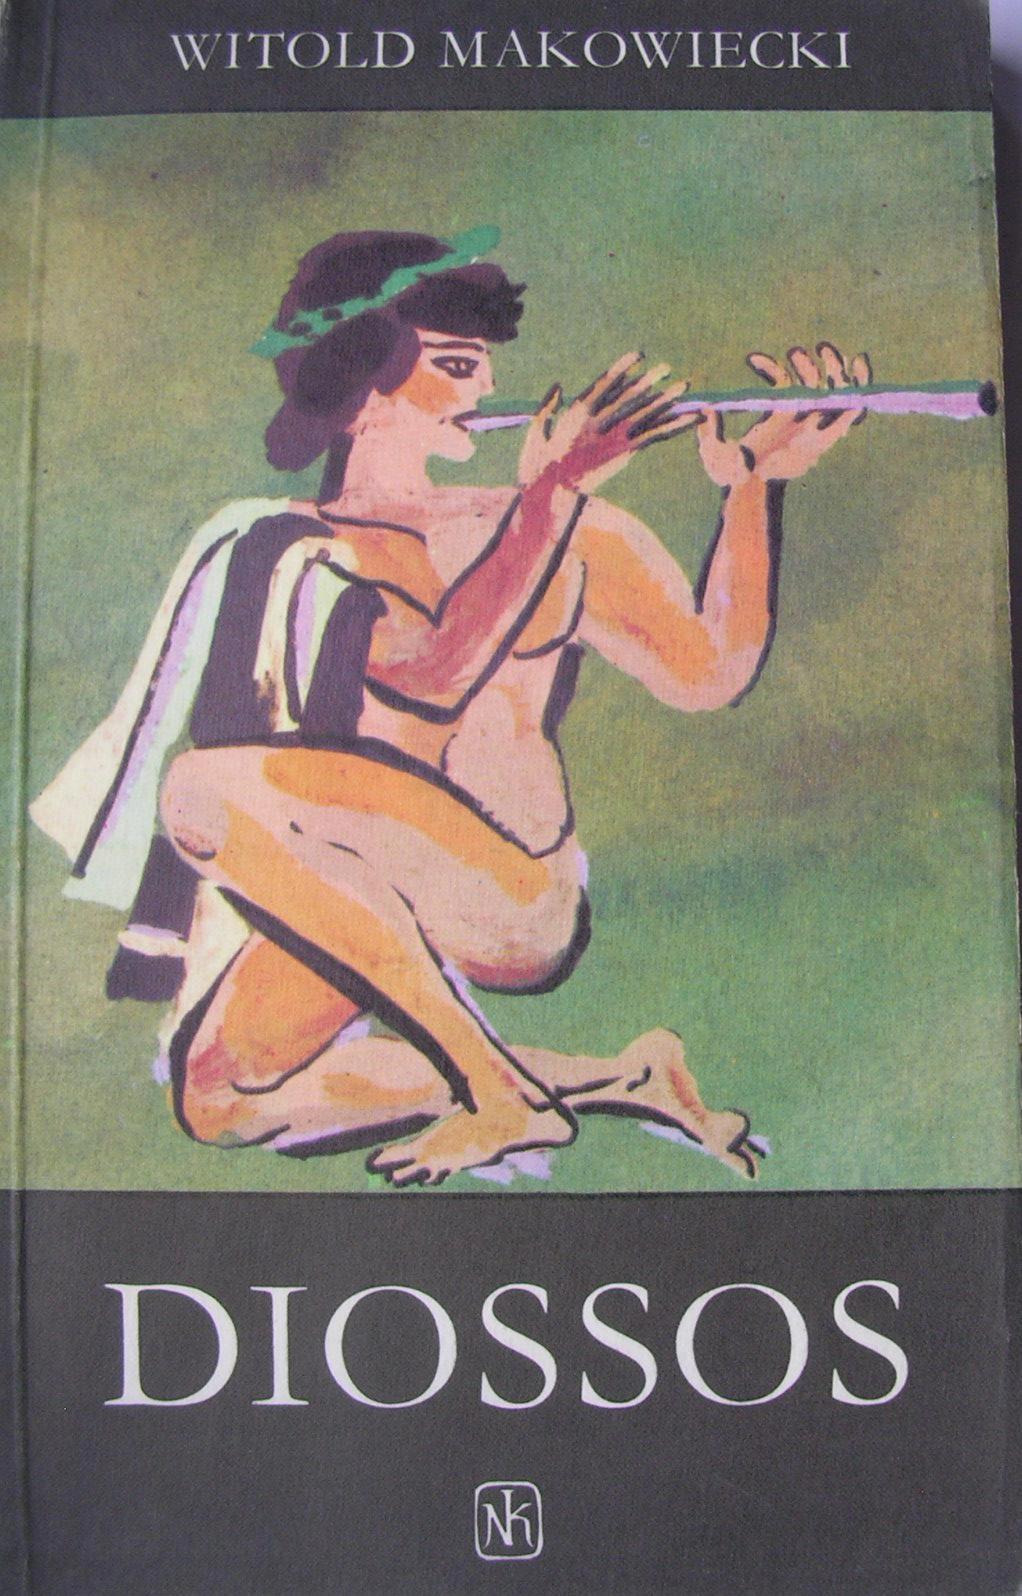 Diossos - Witold Makowiecki BDB